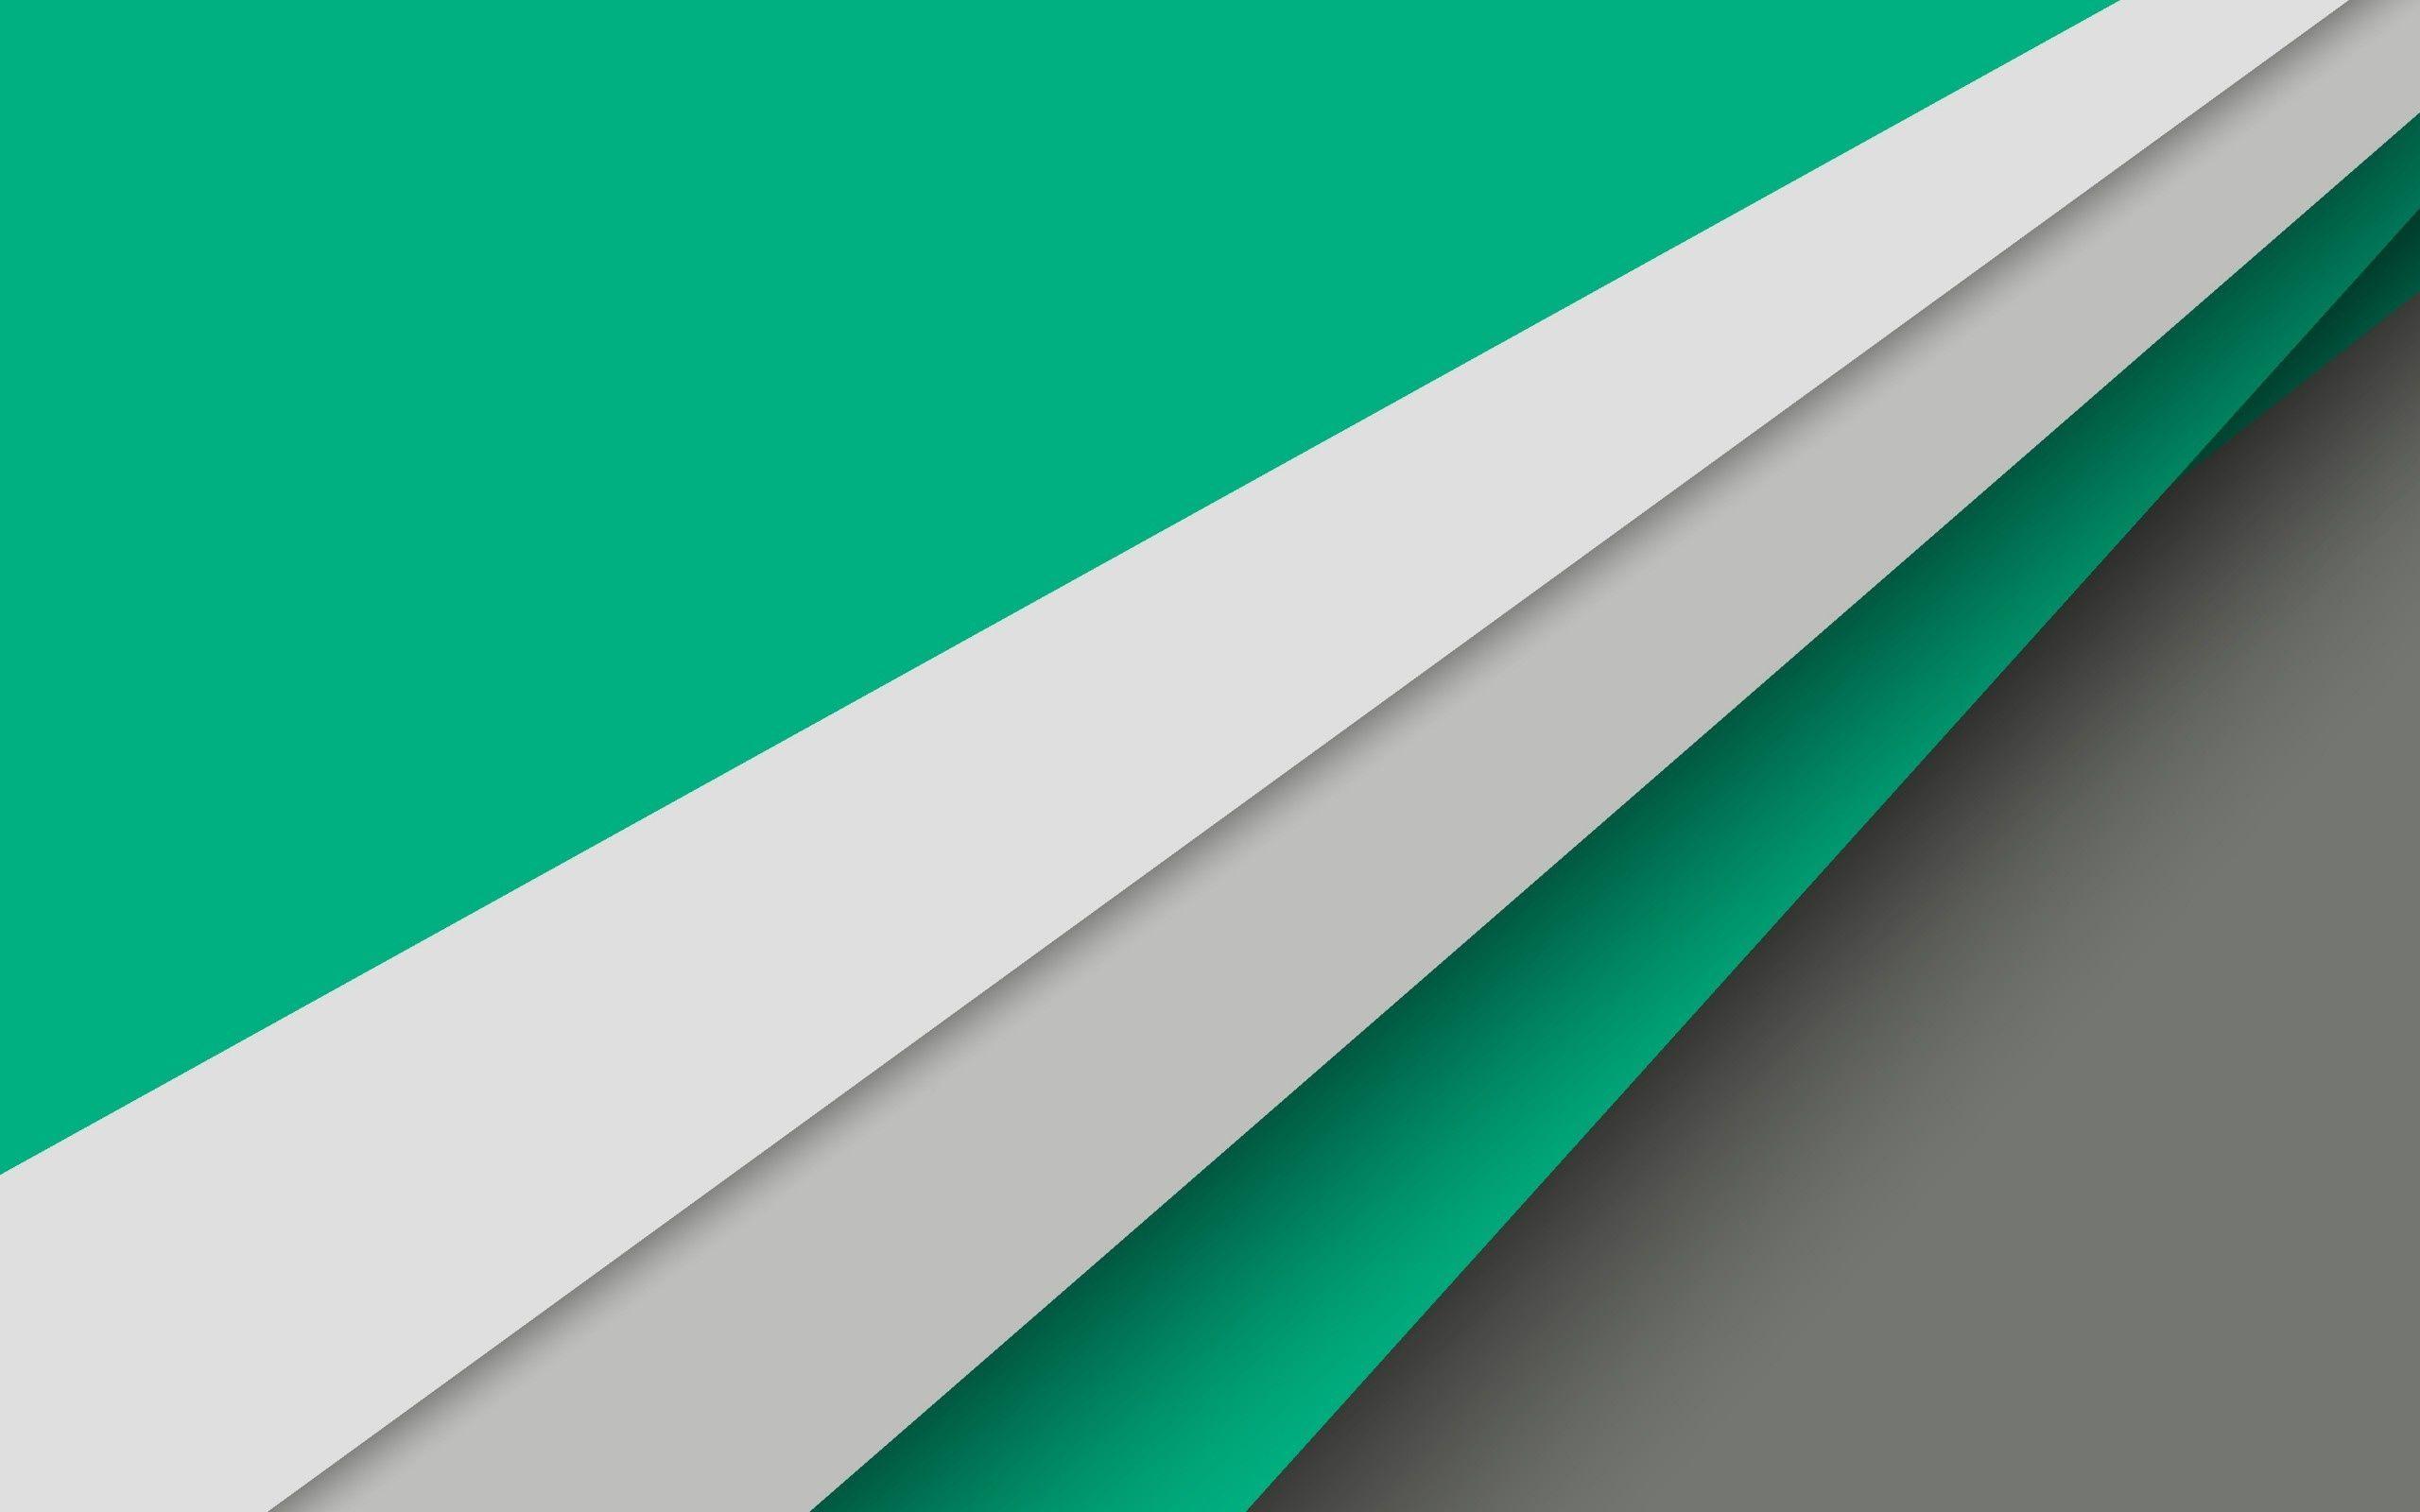 Android 5 0 Lollipop Default Abstract Wallpaper 3d Wallpaper